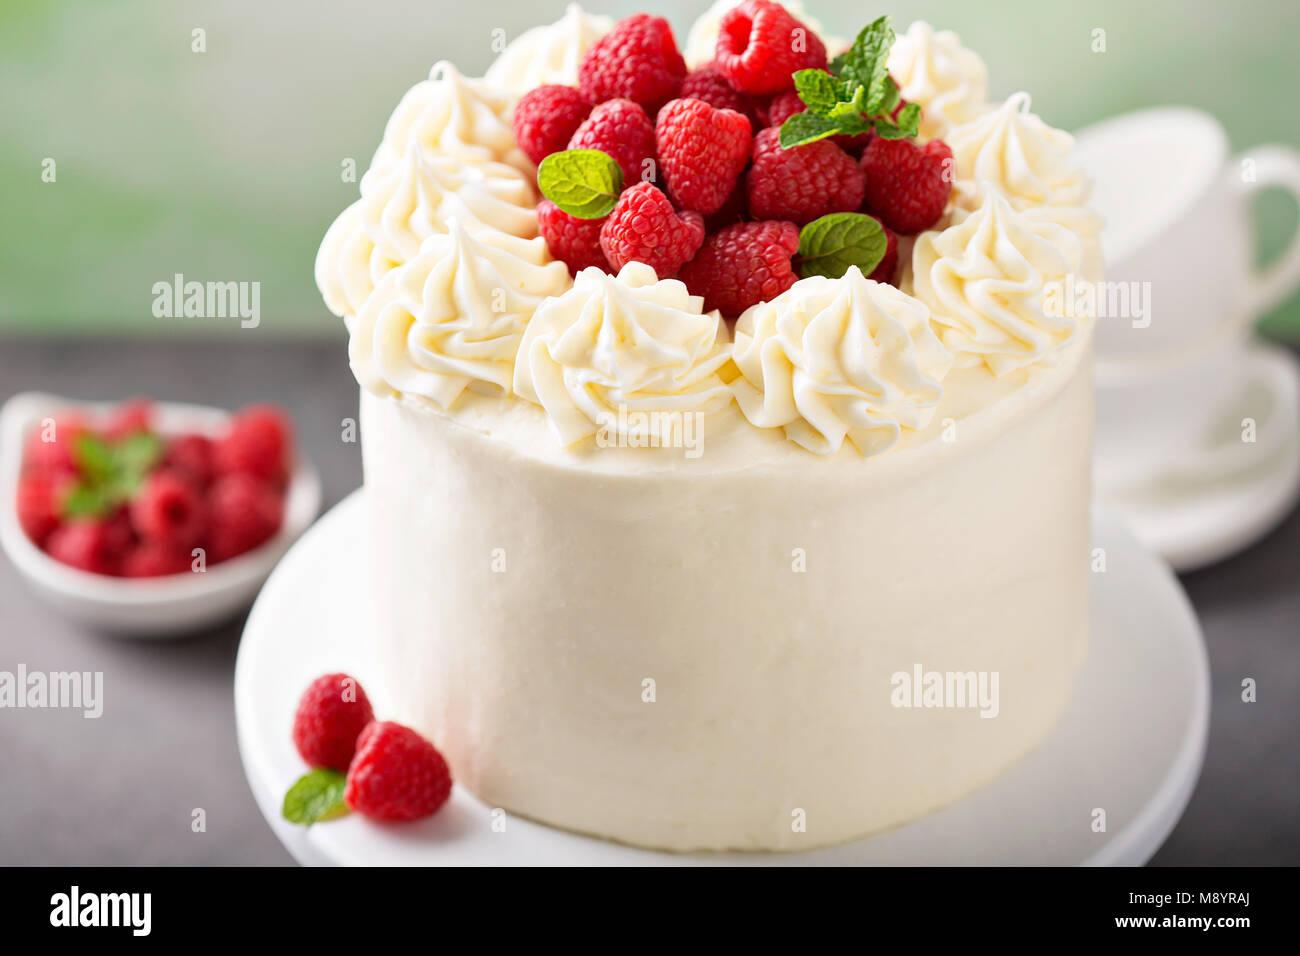 Vanilla raspberry cake with white frosting - Stock Image